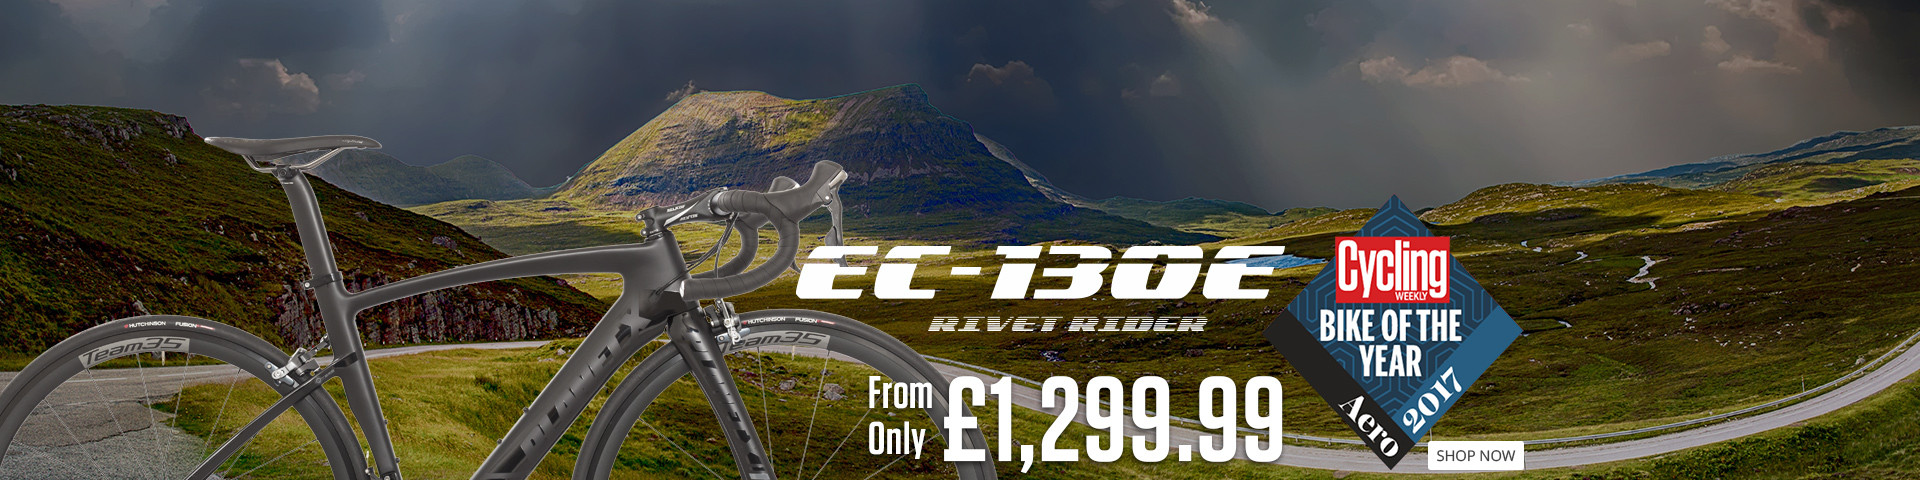 Ec-130E Rivet Rider - Cycling Weekly Aero Road Bike of the Year